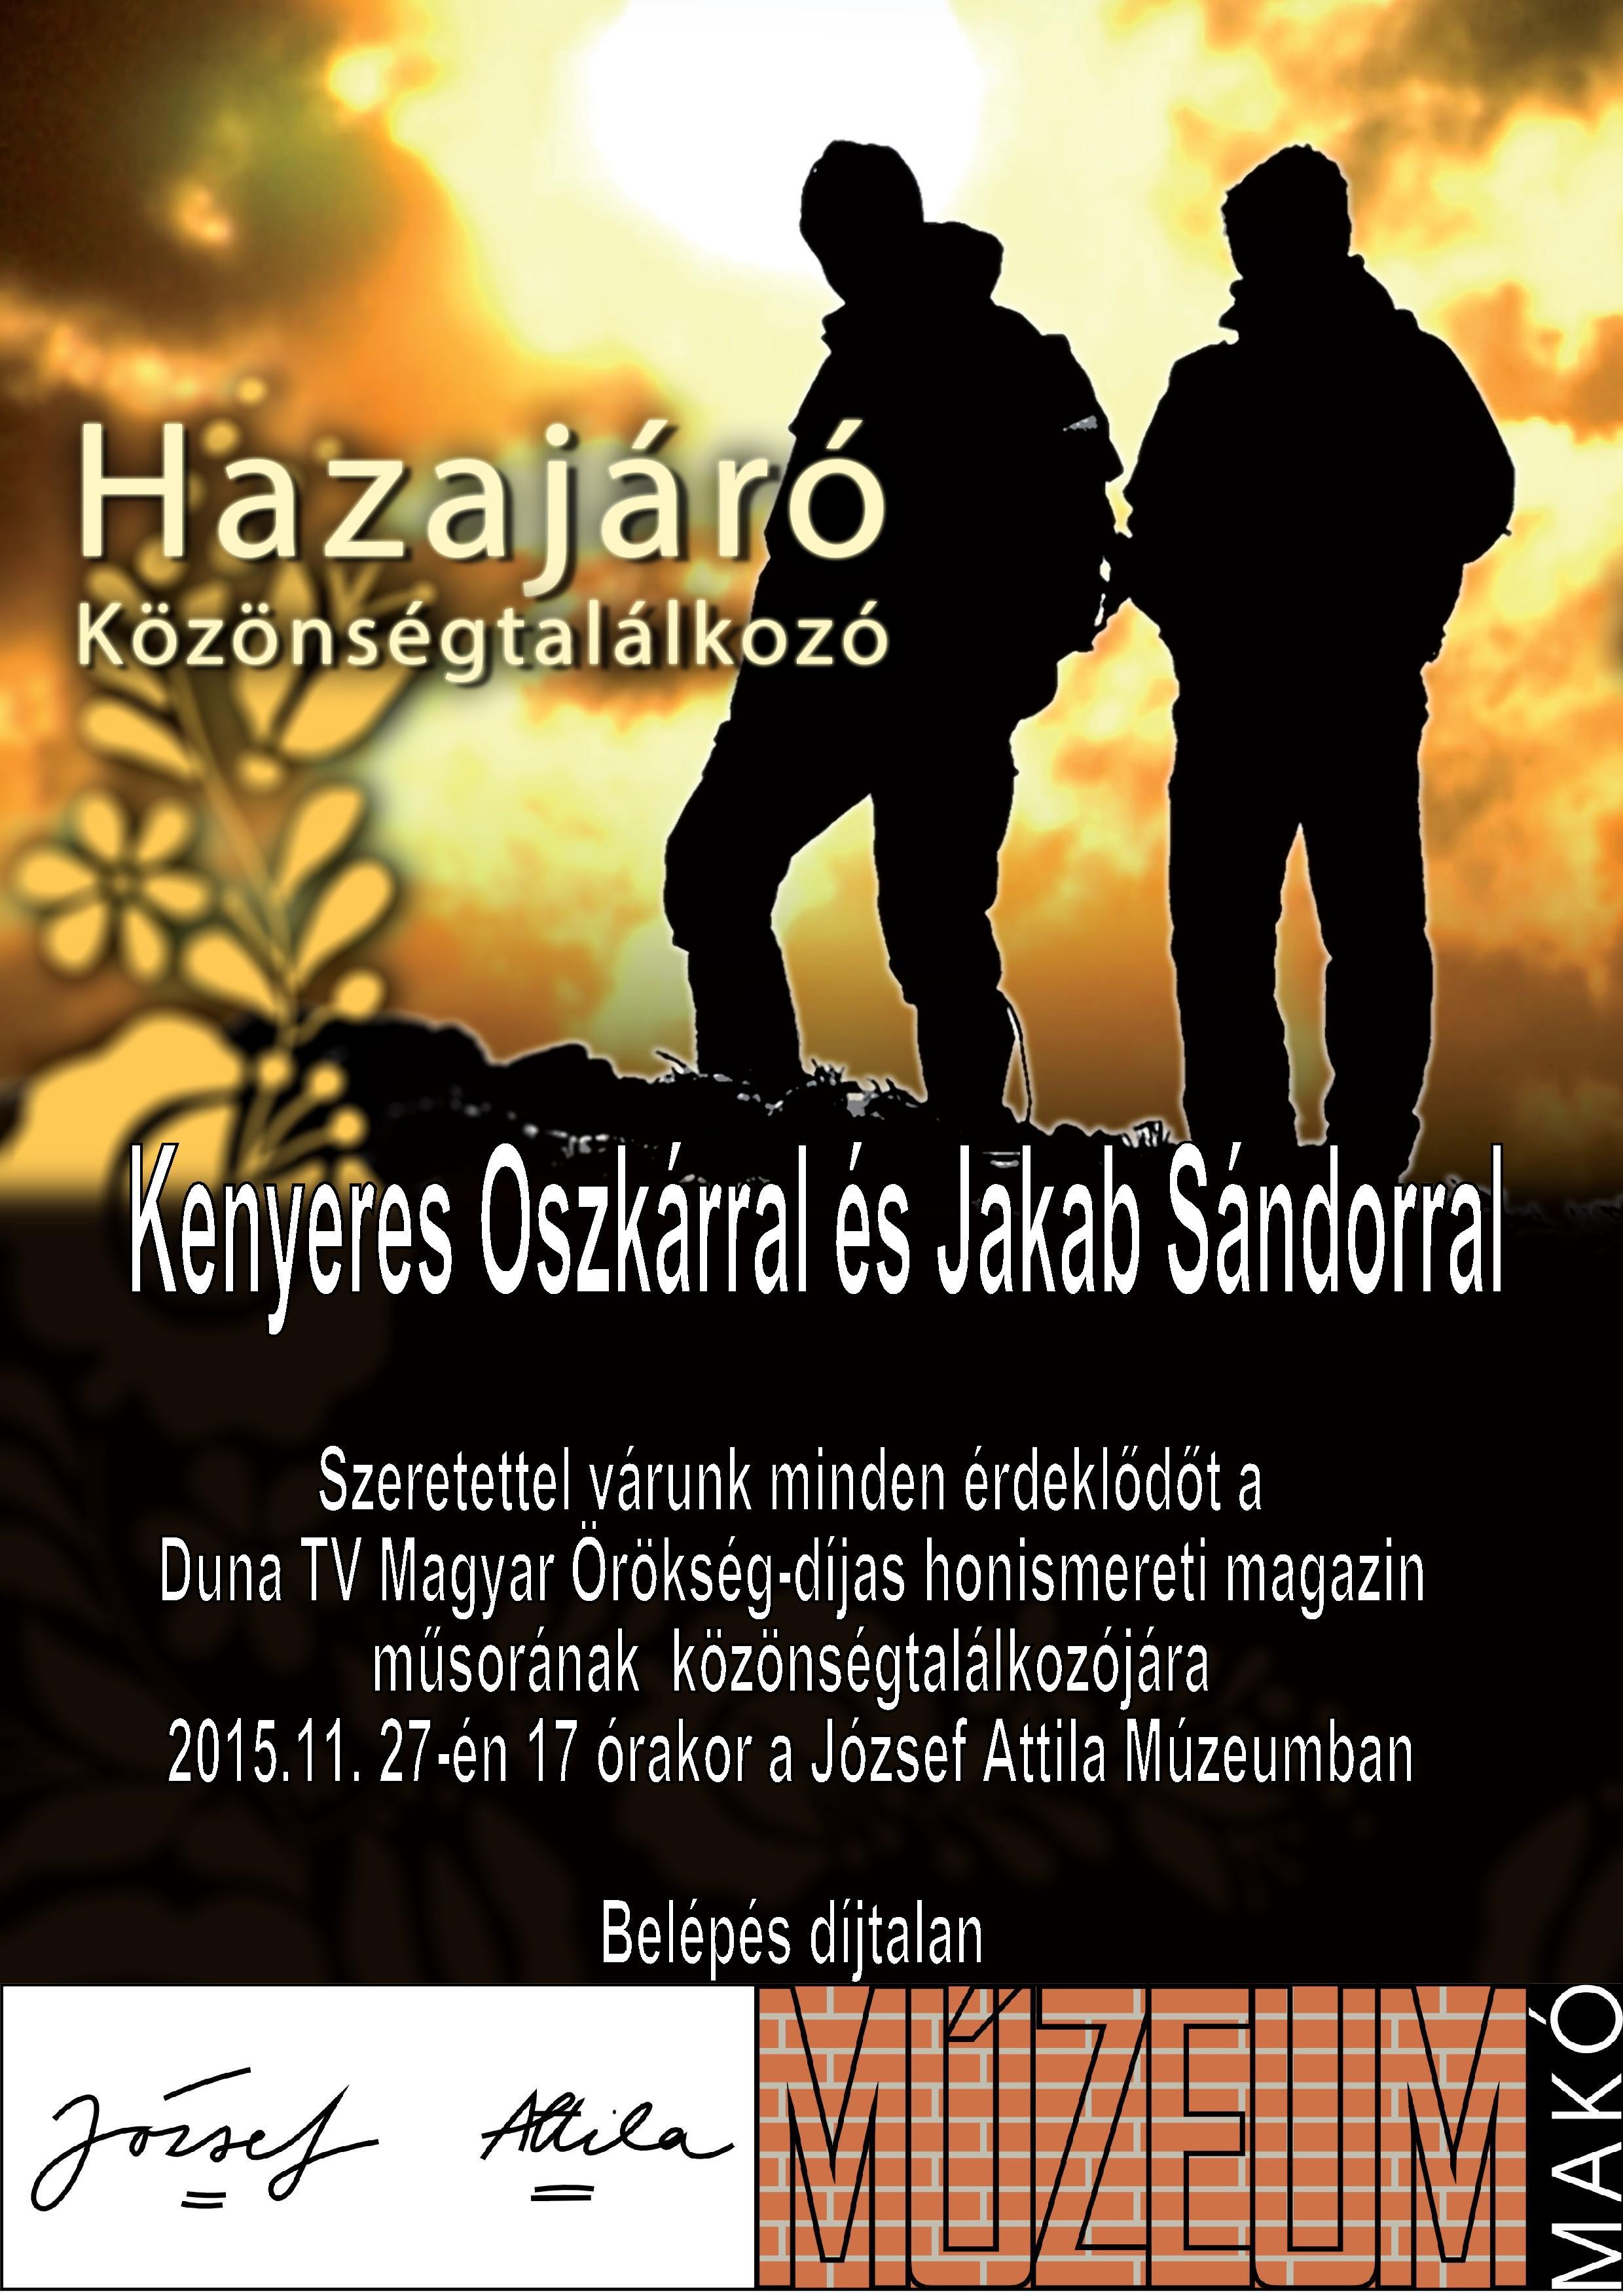 hazajaro_kozonsegtalalkozo_151127plakat